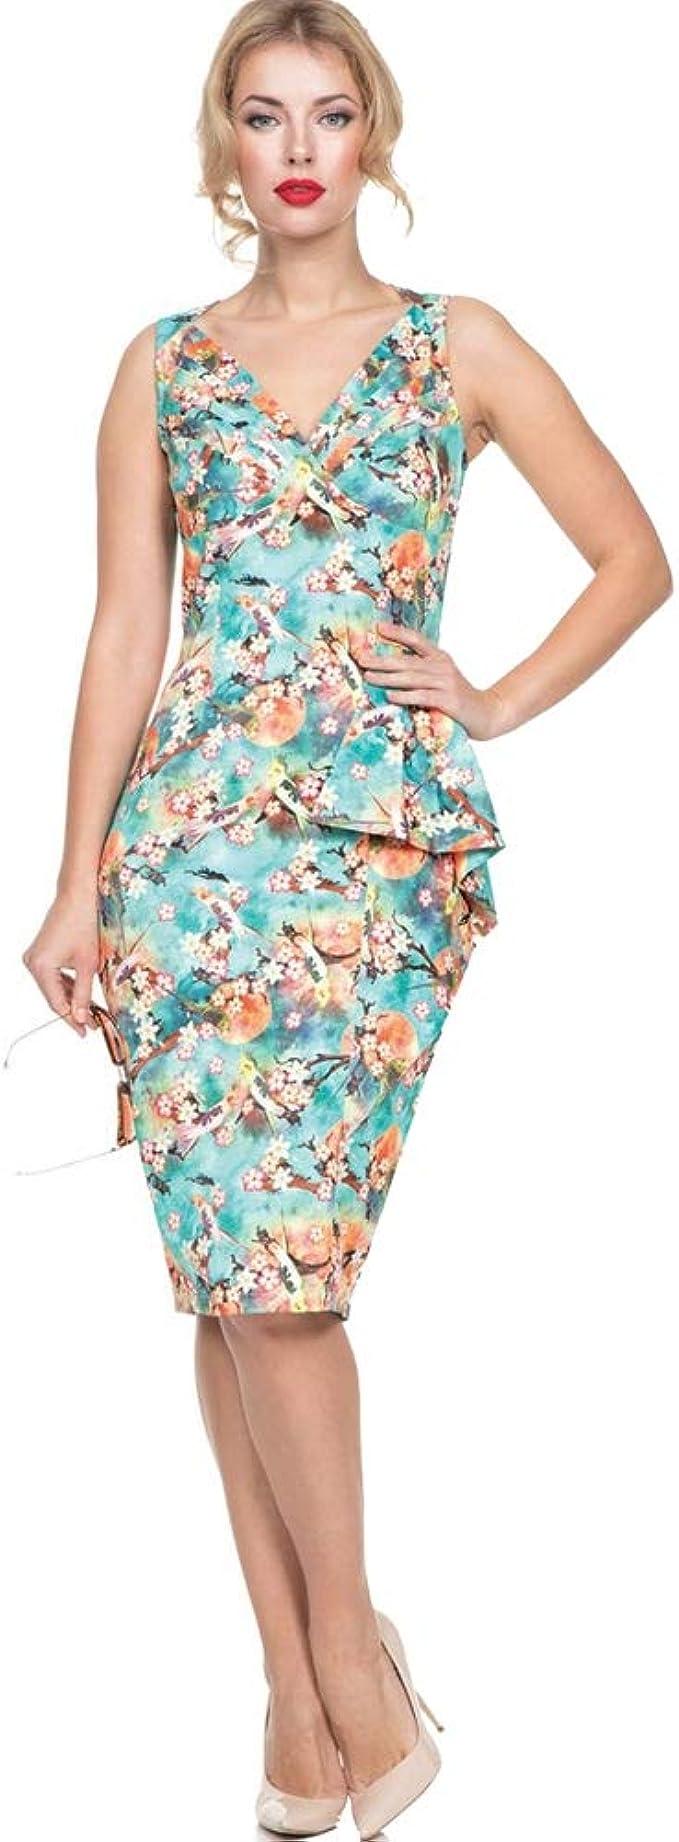 Pin Up Dresses | Pinup Clothing & Fashion Voodoo Vixen Jessa Tropical Bird Print Pencil Dress Green  AT vintagedancer.com